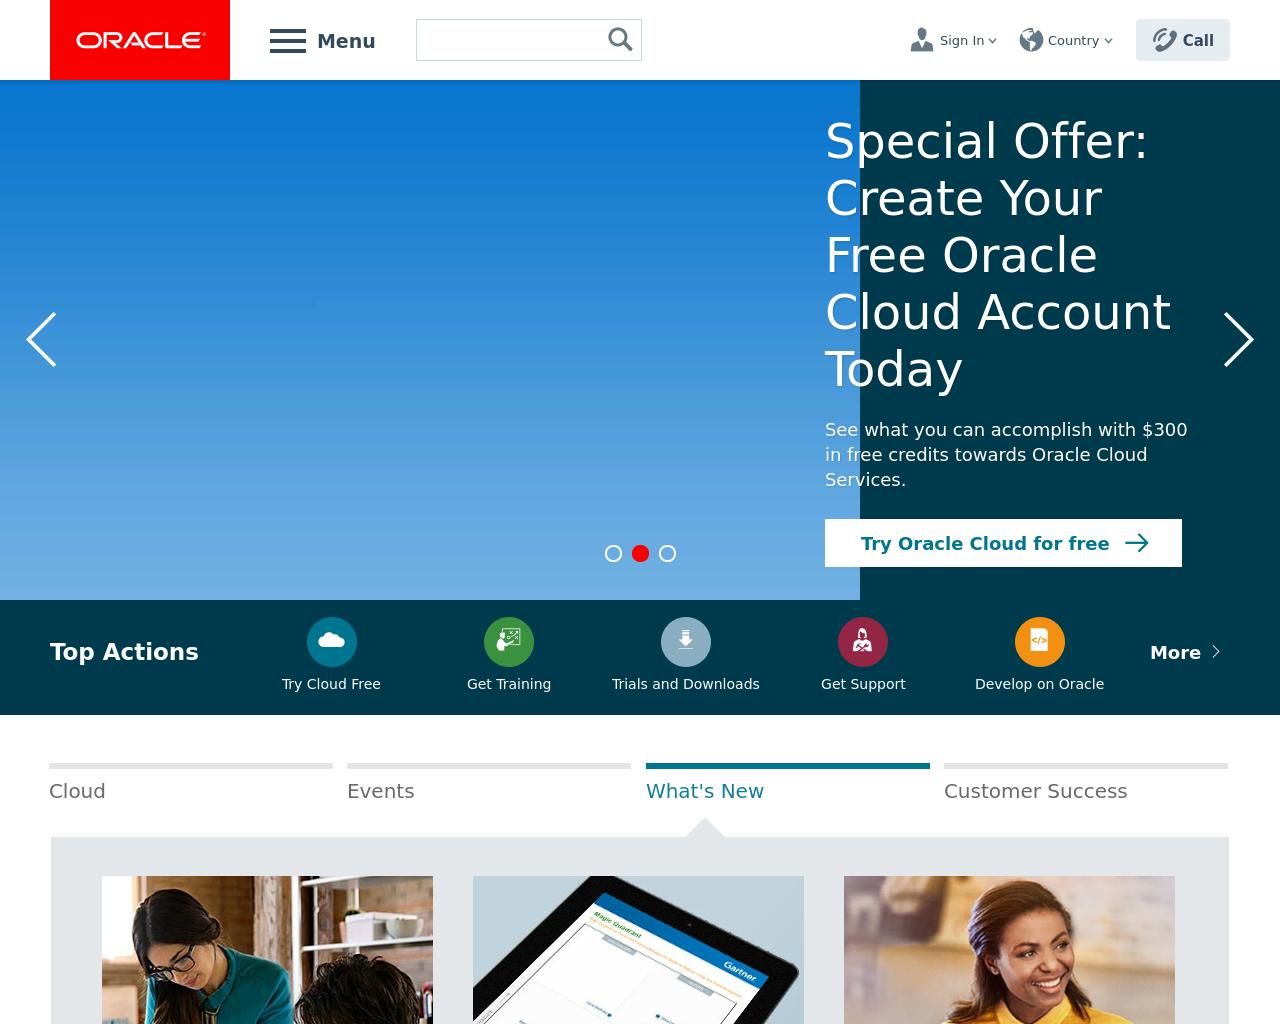 Oracle-Social-Marketing-Cloud-Advertising-Reviews-Pricing